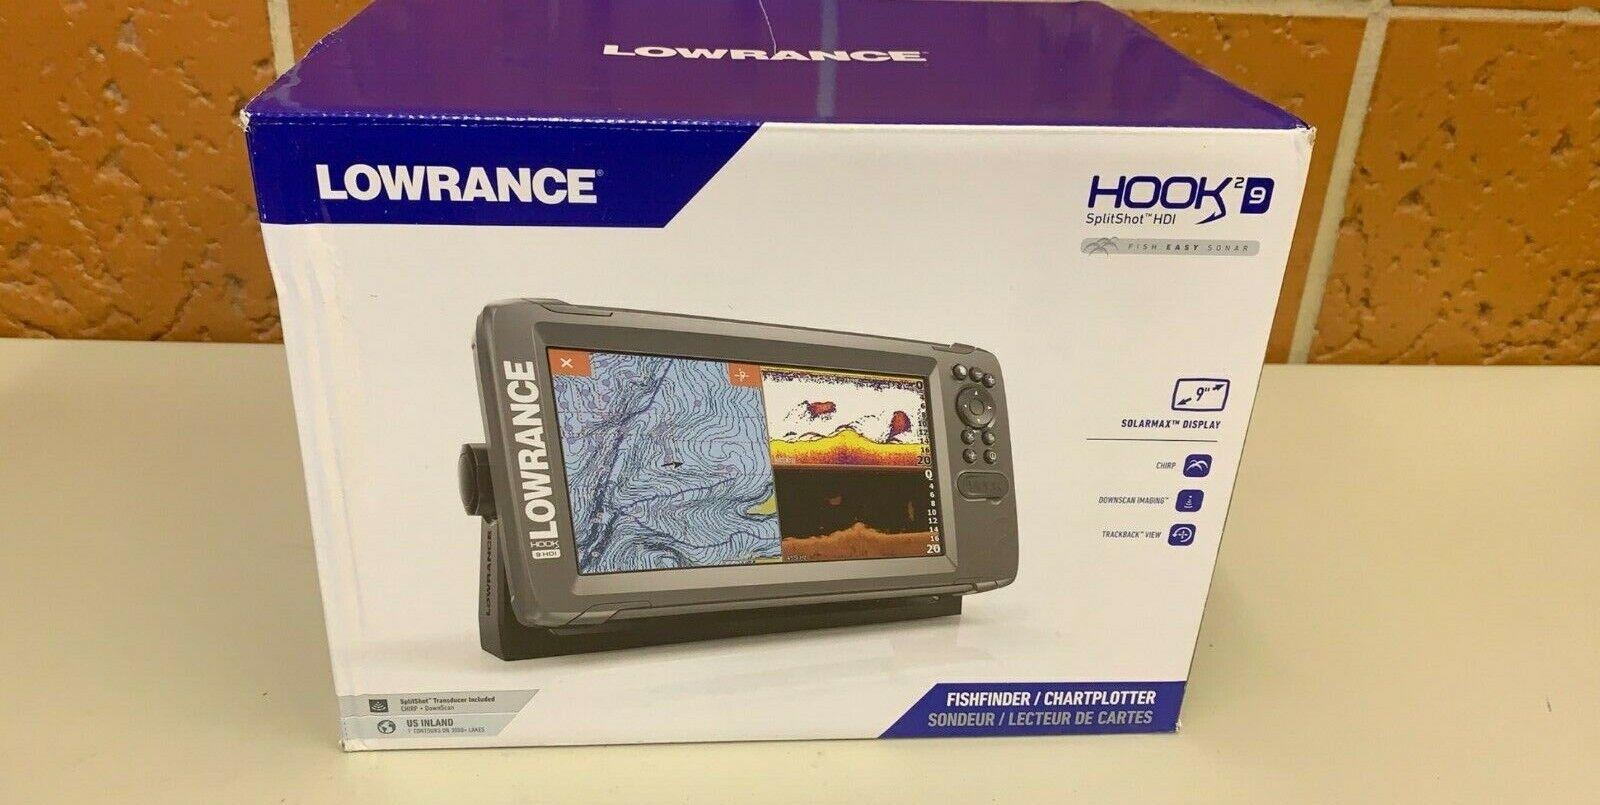 Lowrance HOOK2-9 SplitShot Fishfinder Chartplotter US Inland